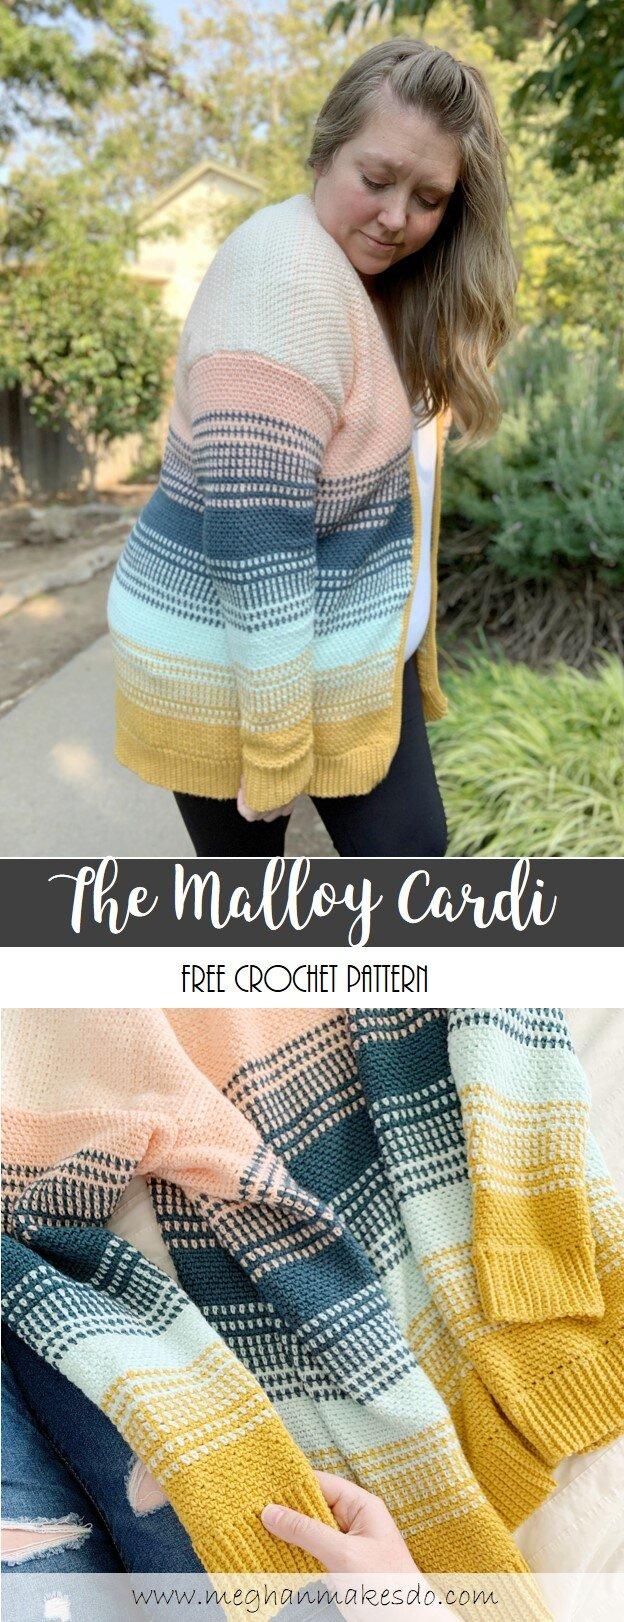 The Malloy Cardi Free Crochet Pattern Meghan Makes Do